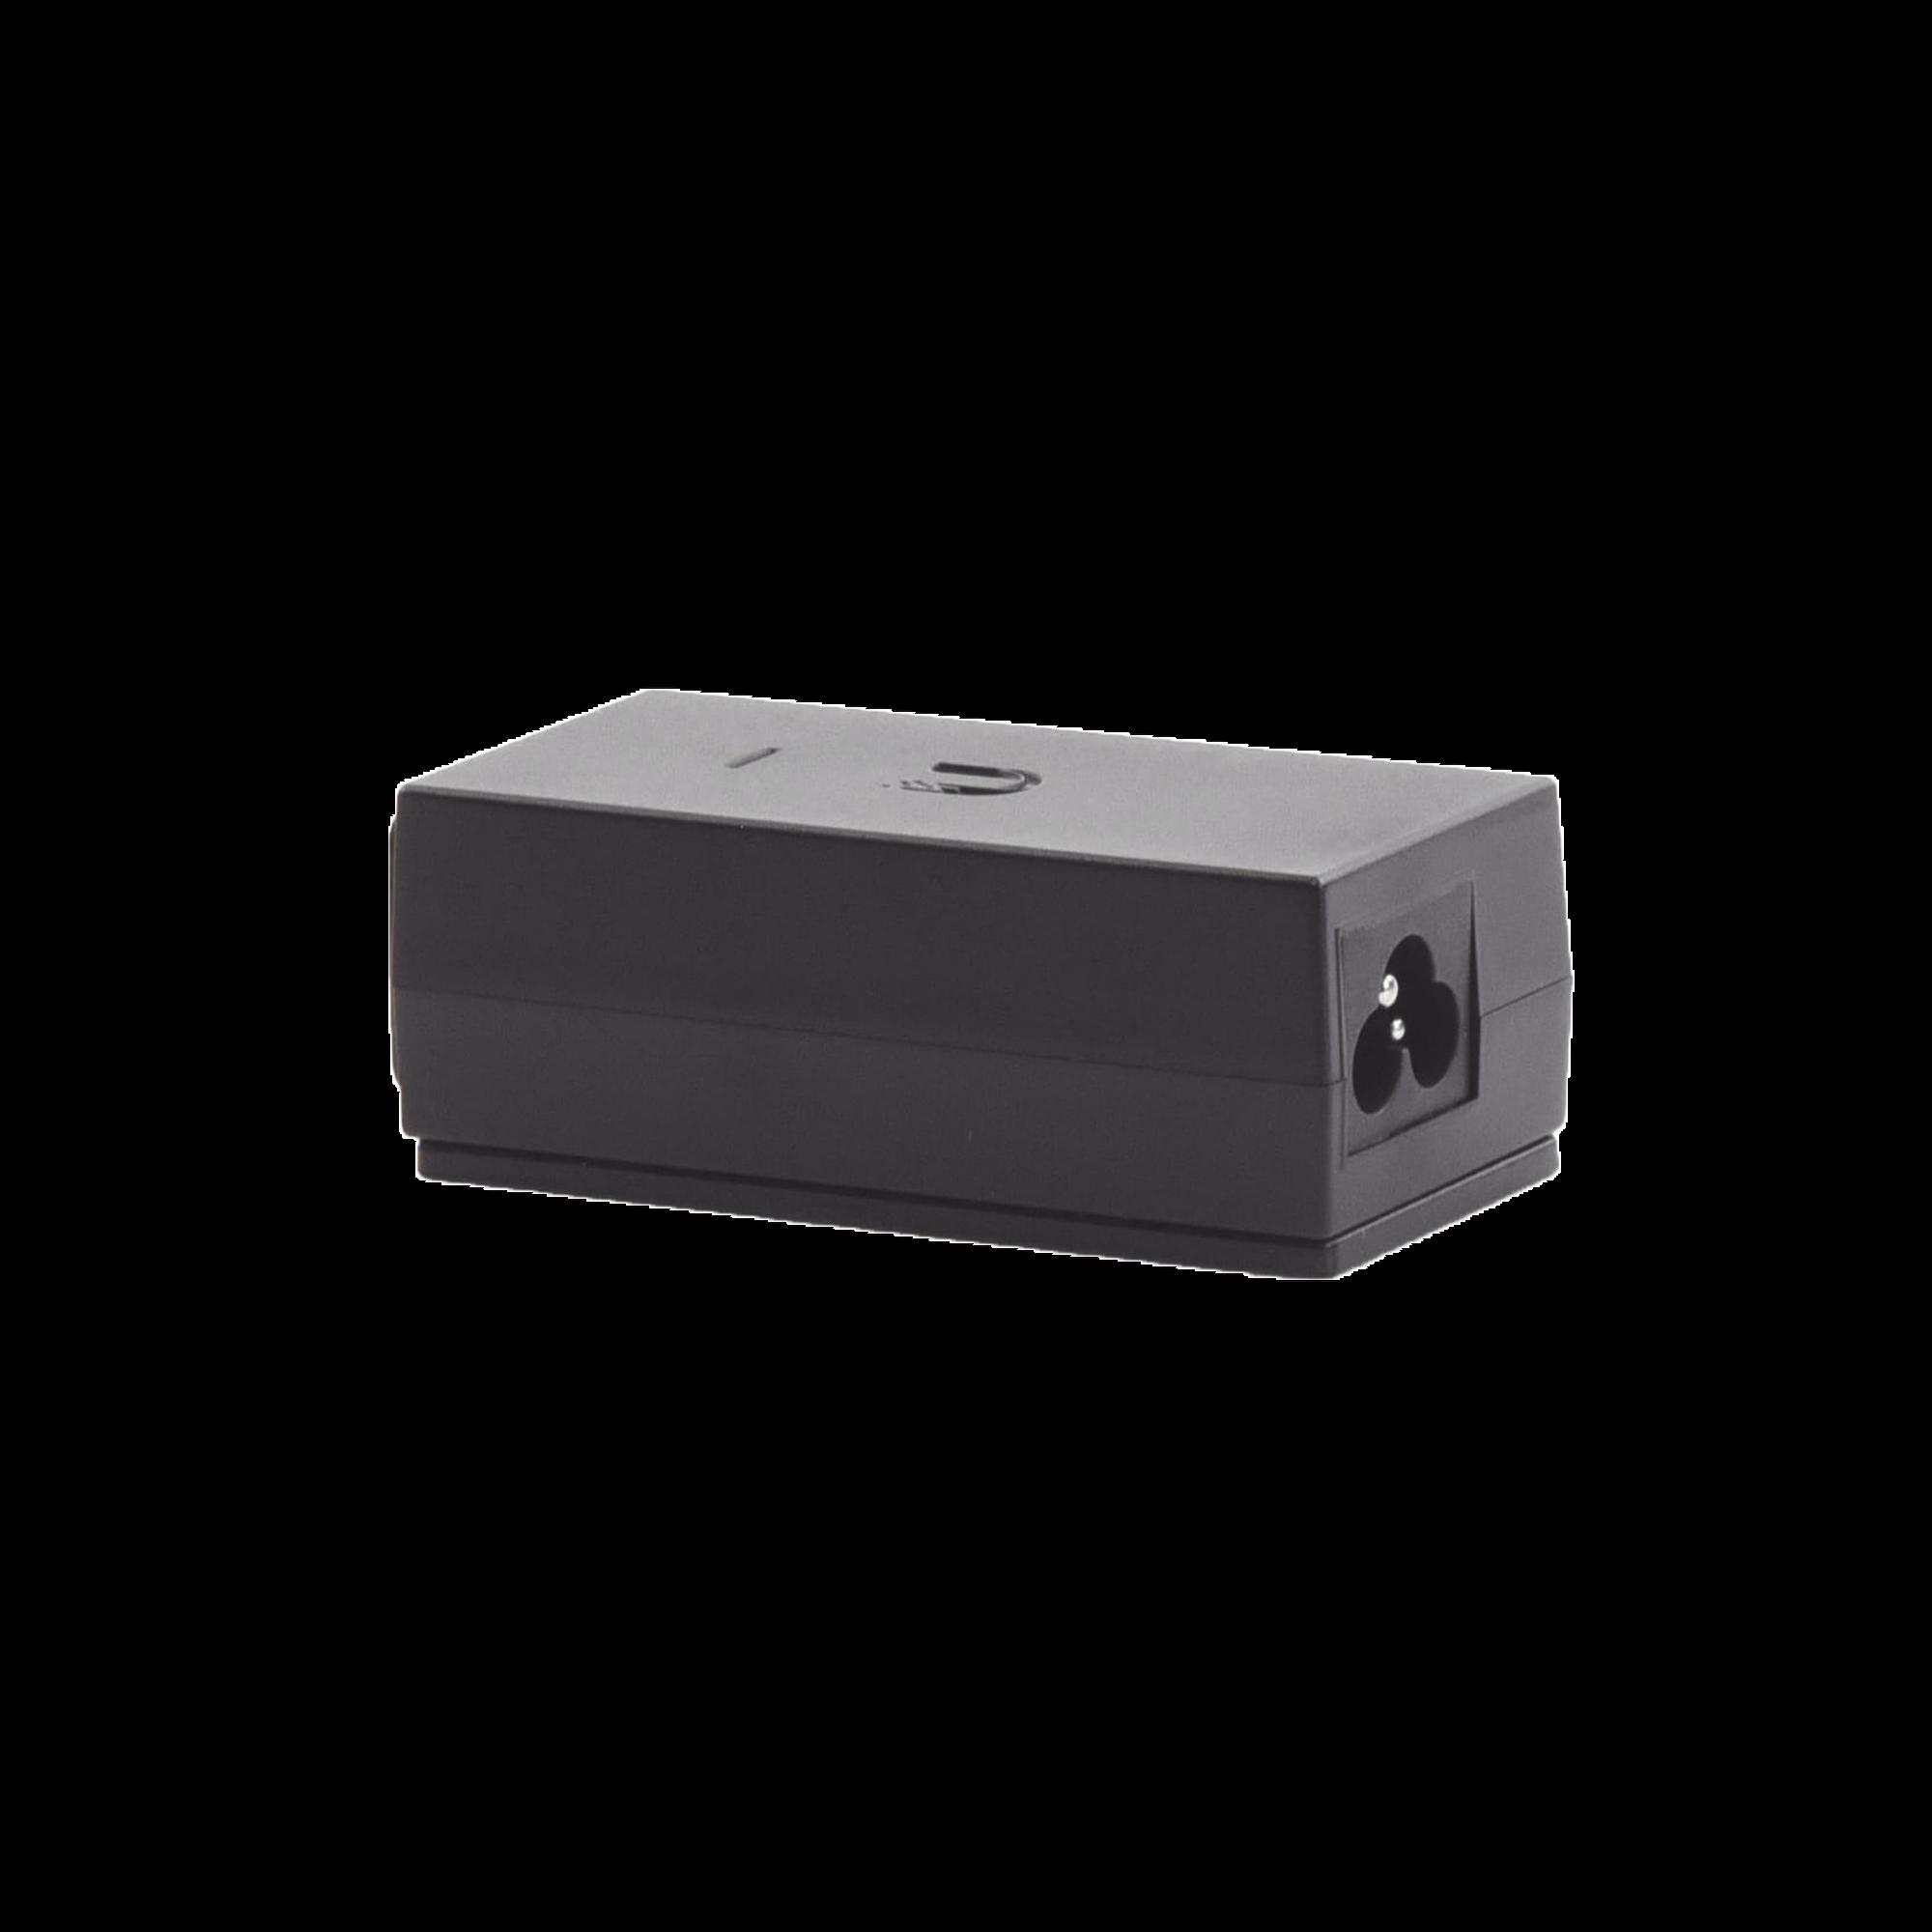 Adaptador PoE Ubiquiti de 24 VDC, 0.5 A con puerto Gigabit, compatible con airGateway